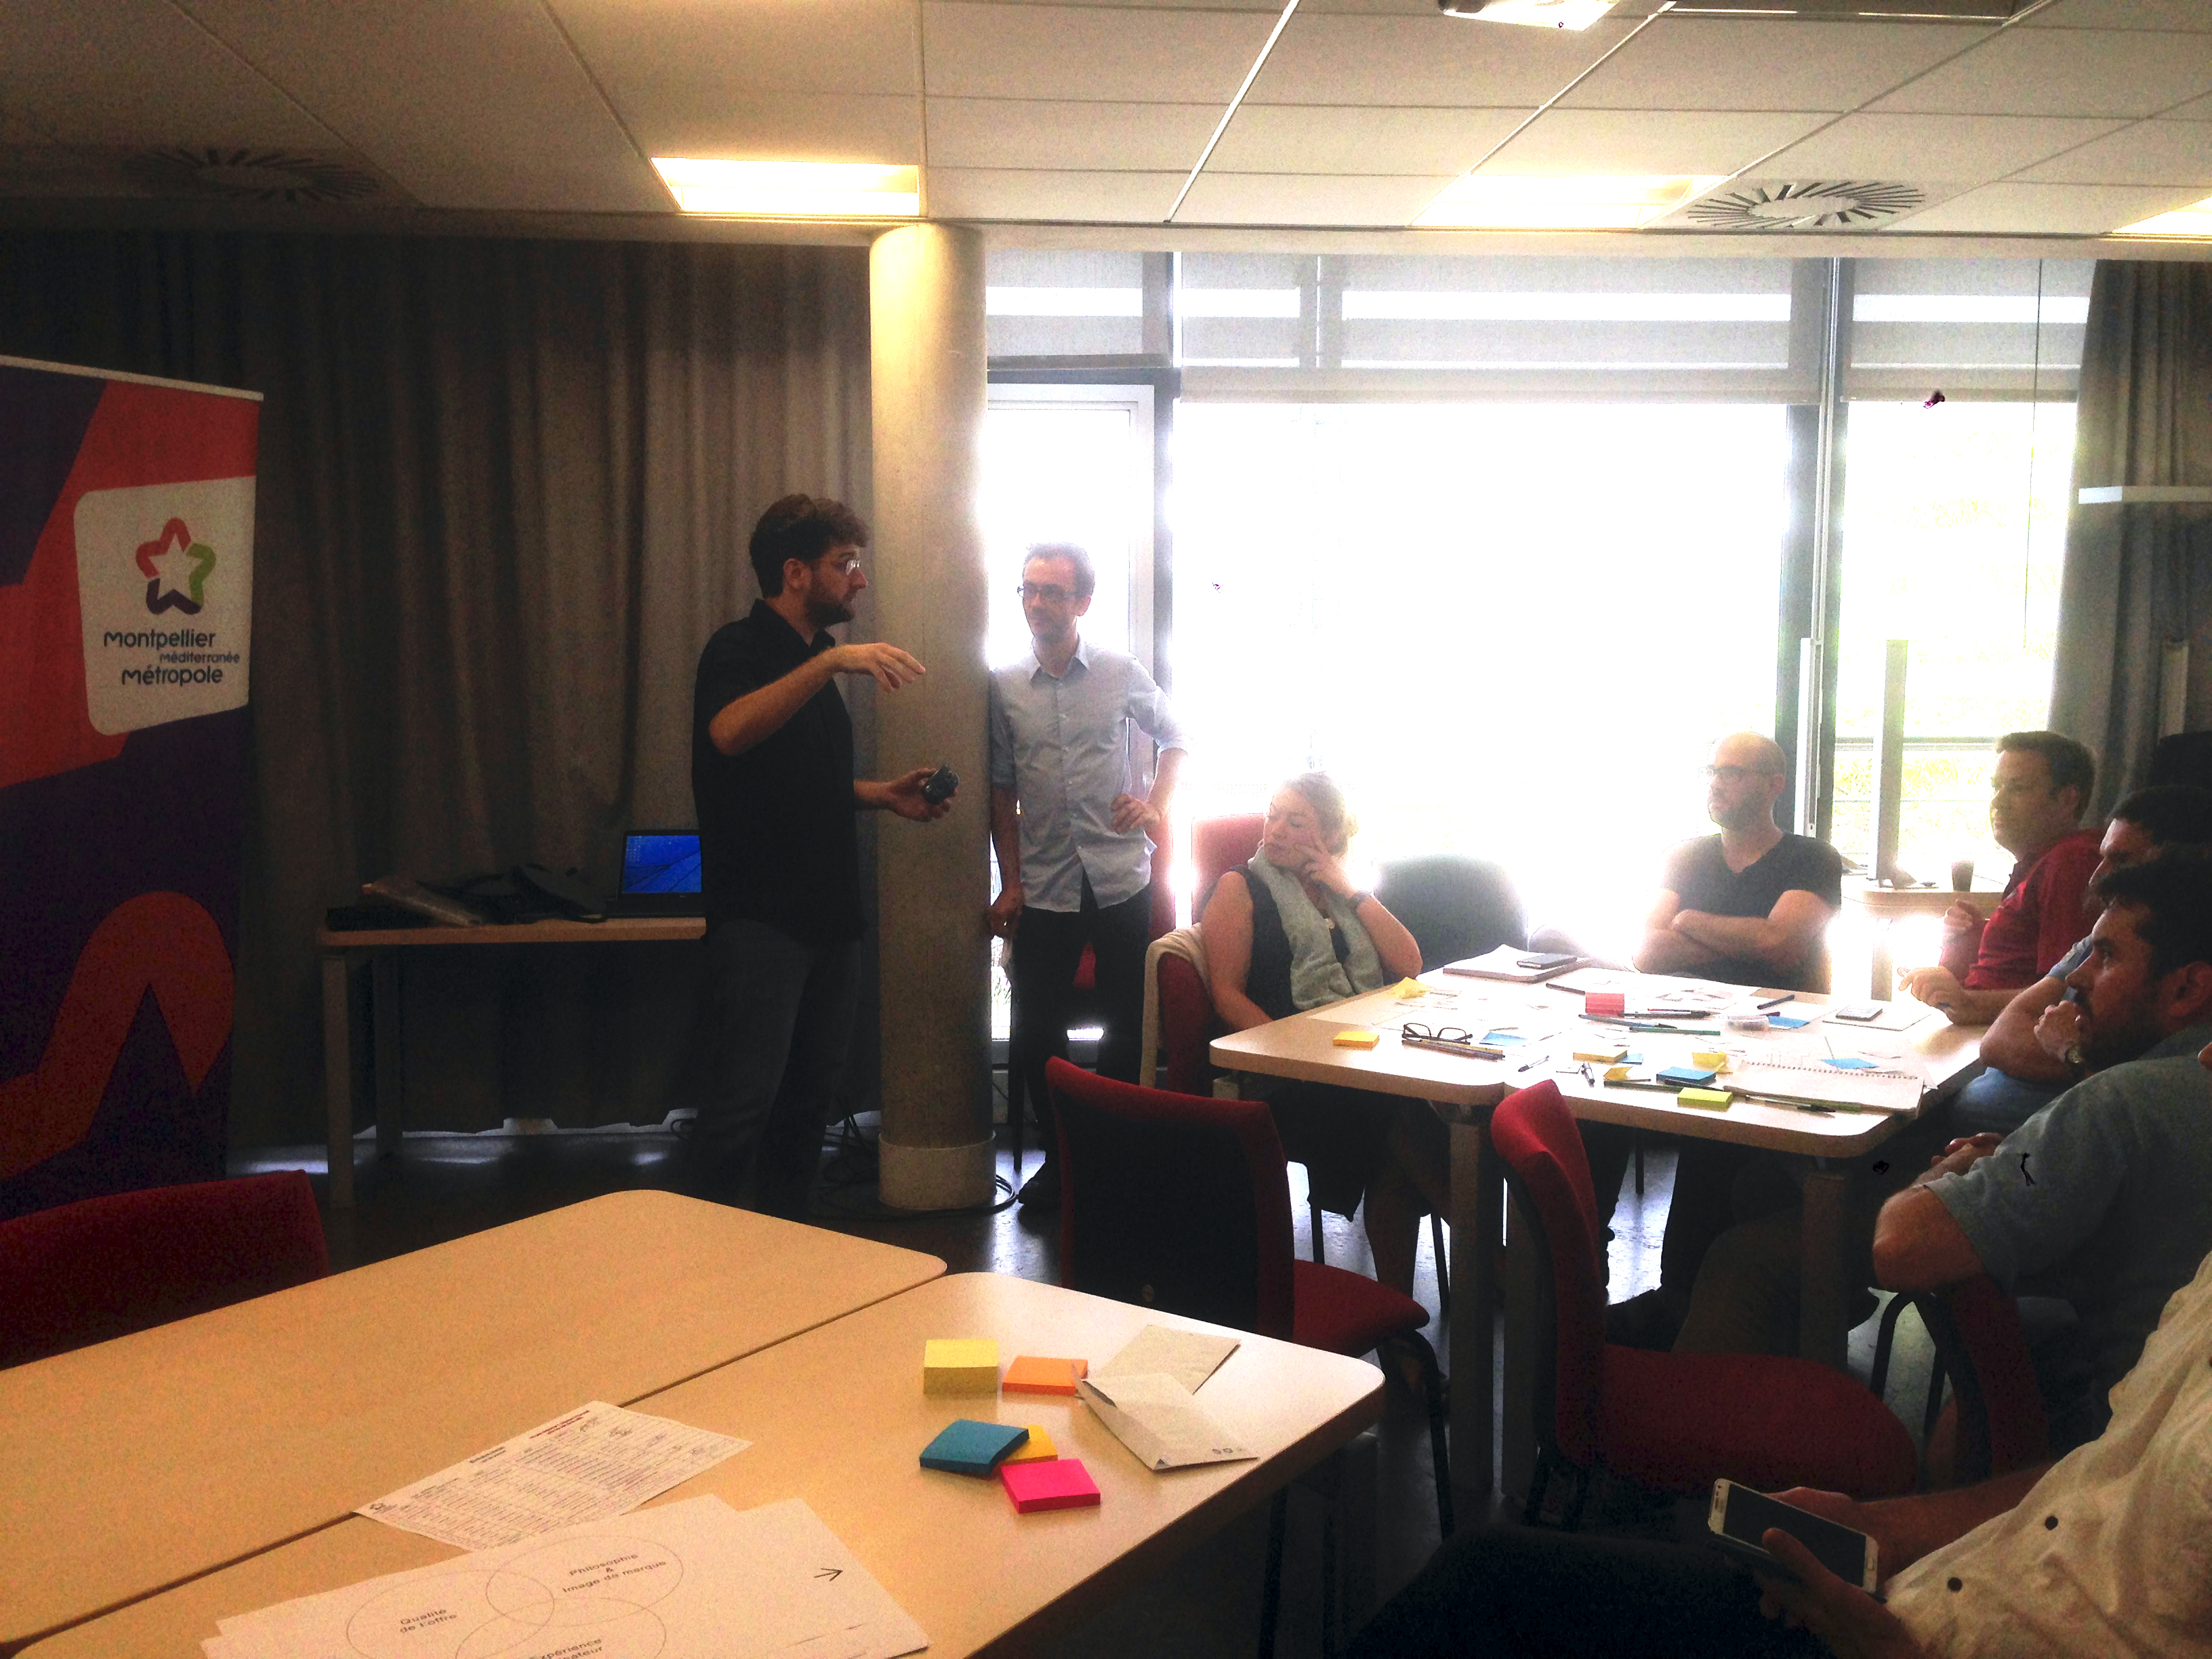 Pilag - DesignLab 4 workshop